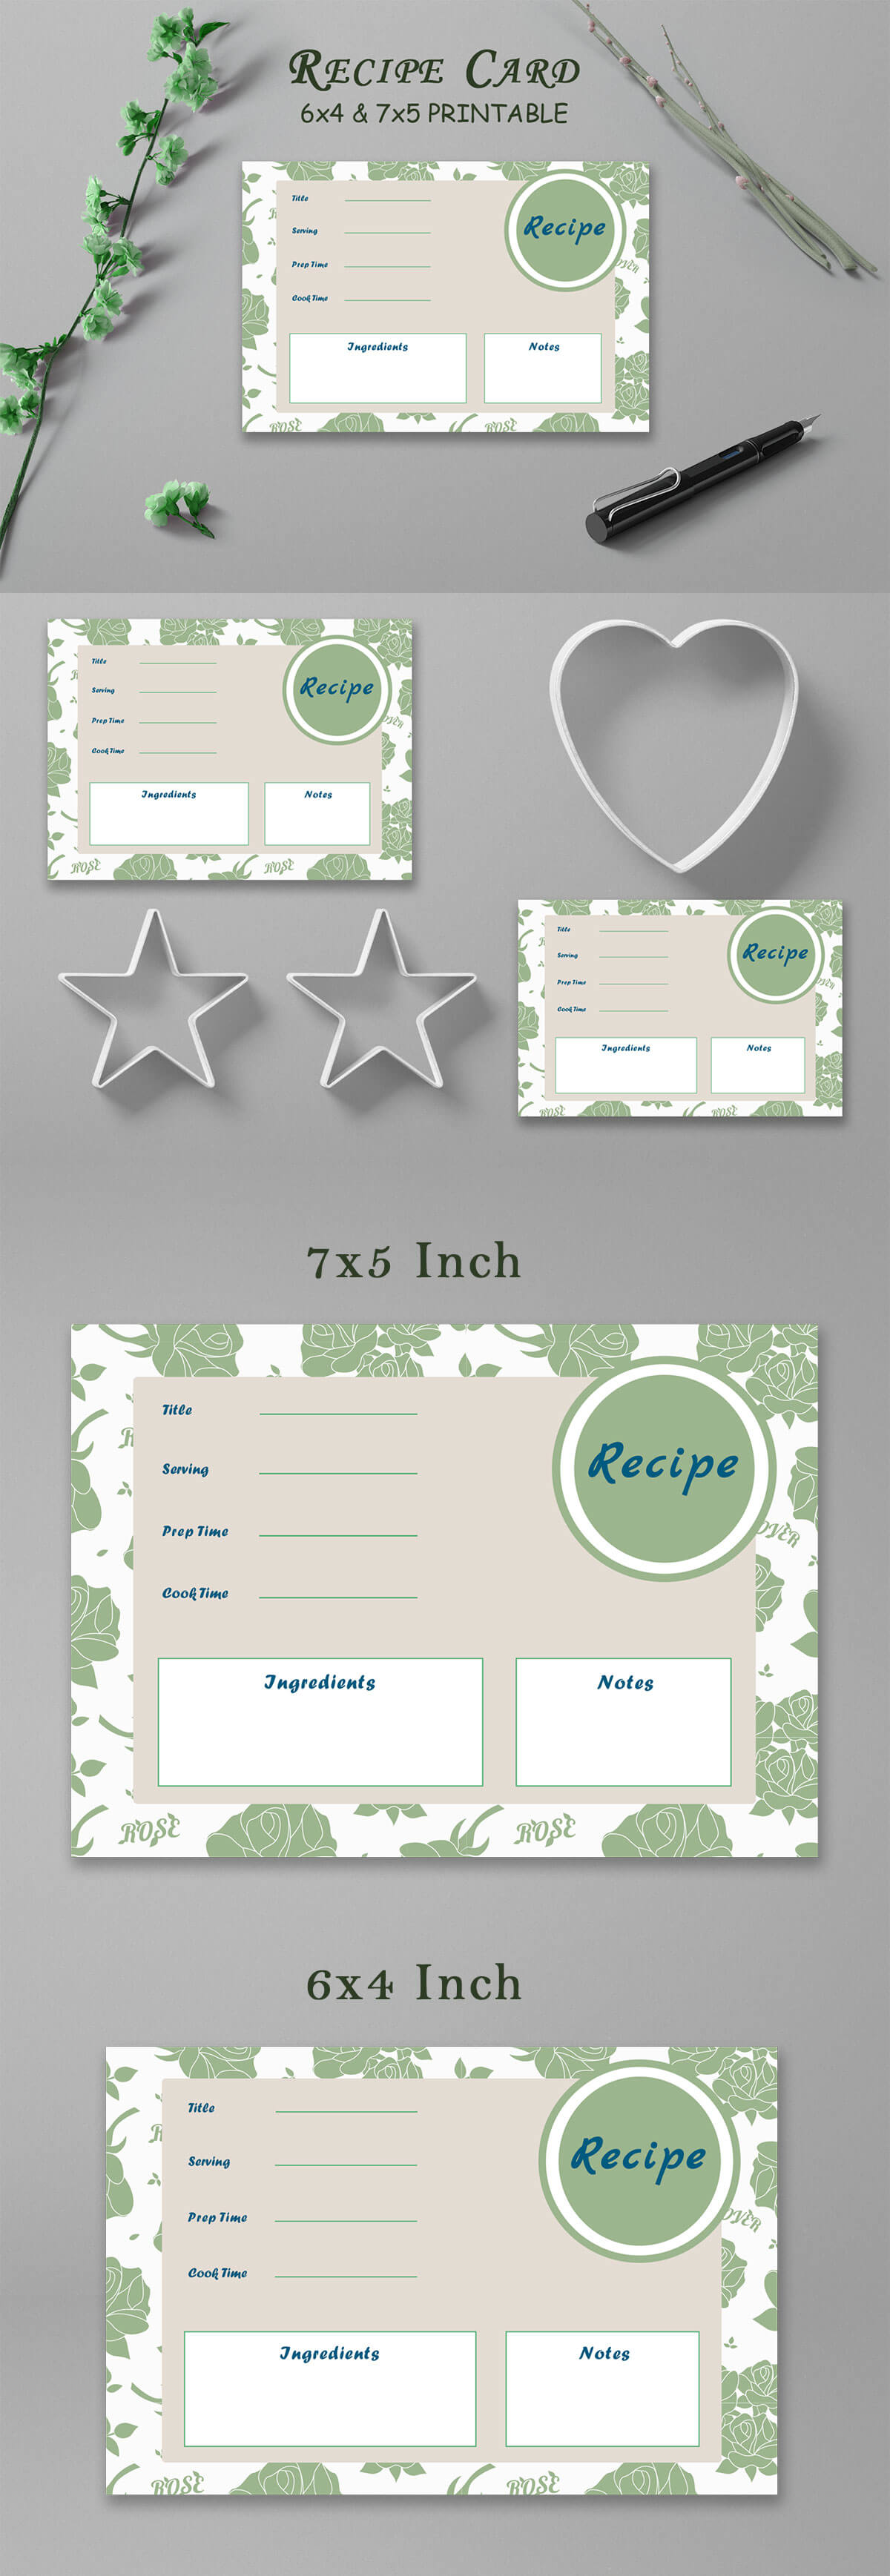 Free Recipe Card Printable Template V17